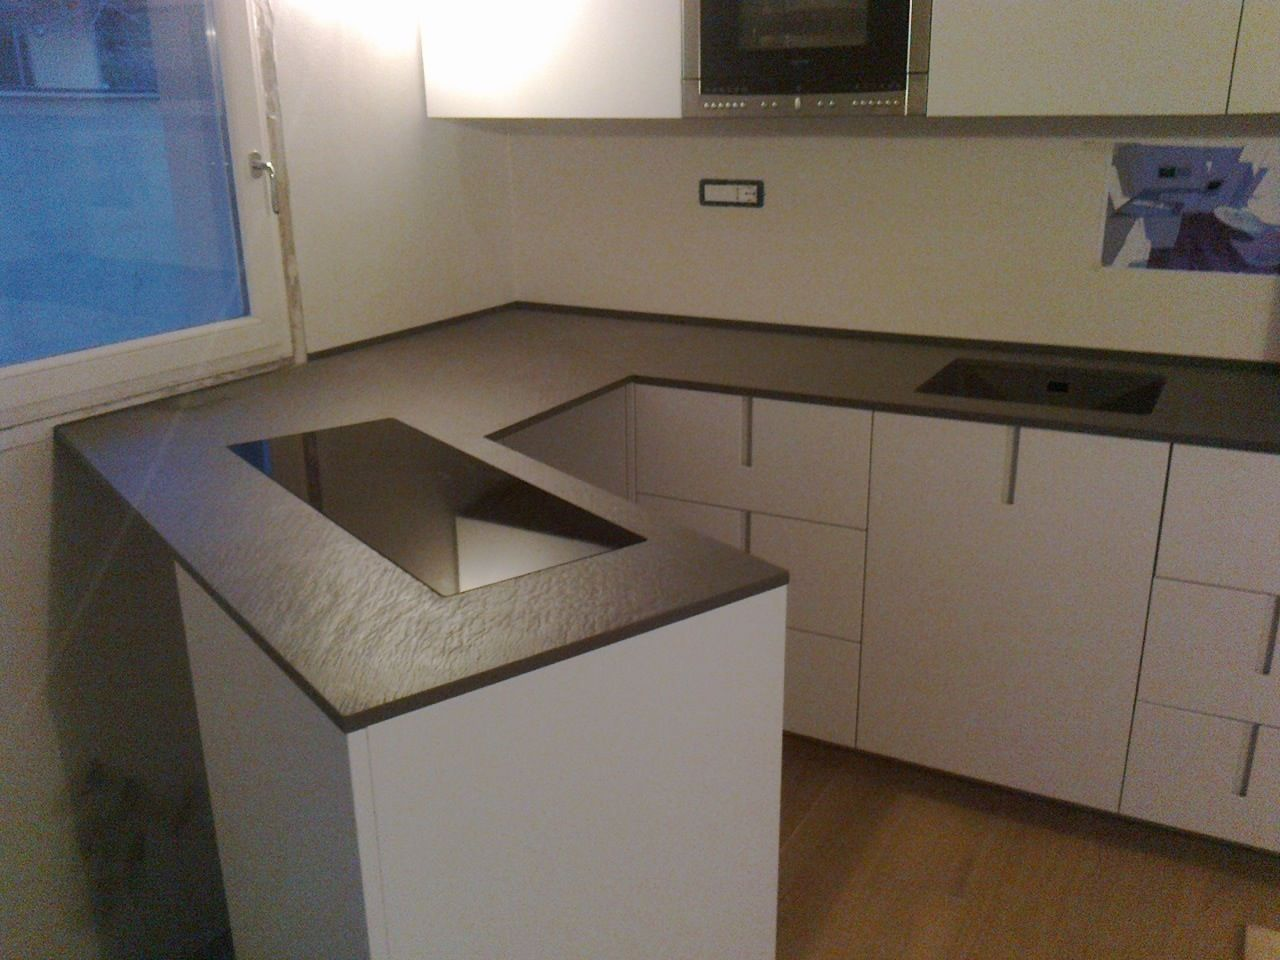 Top cucina rossana in quarzo taupe green stoneitalia vasca stampate in quarzo stoneitalia - Top marmo cucina prezzi ...